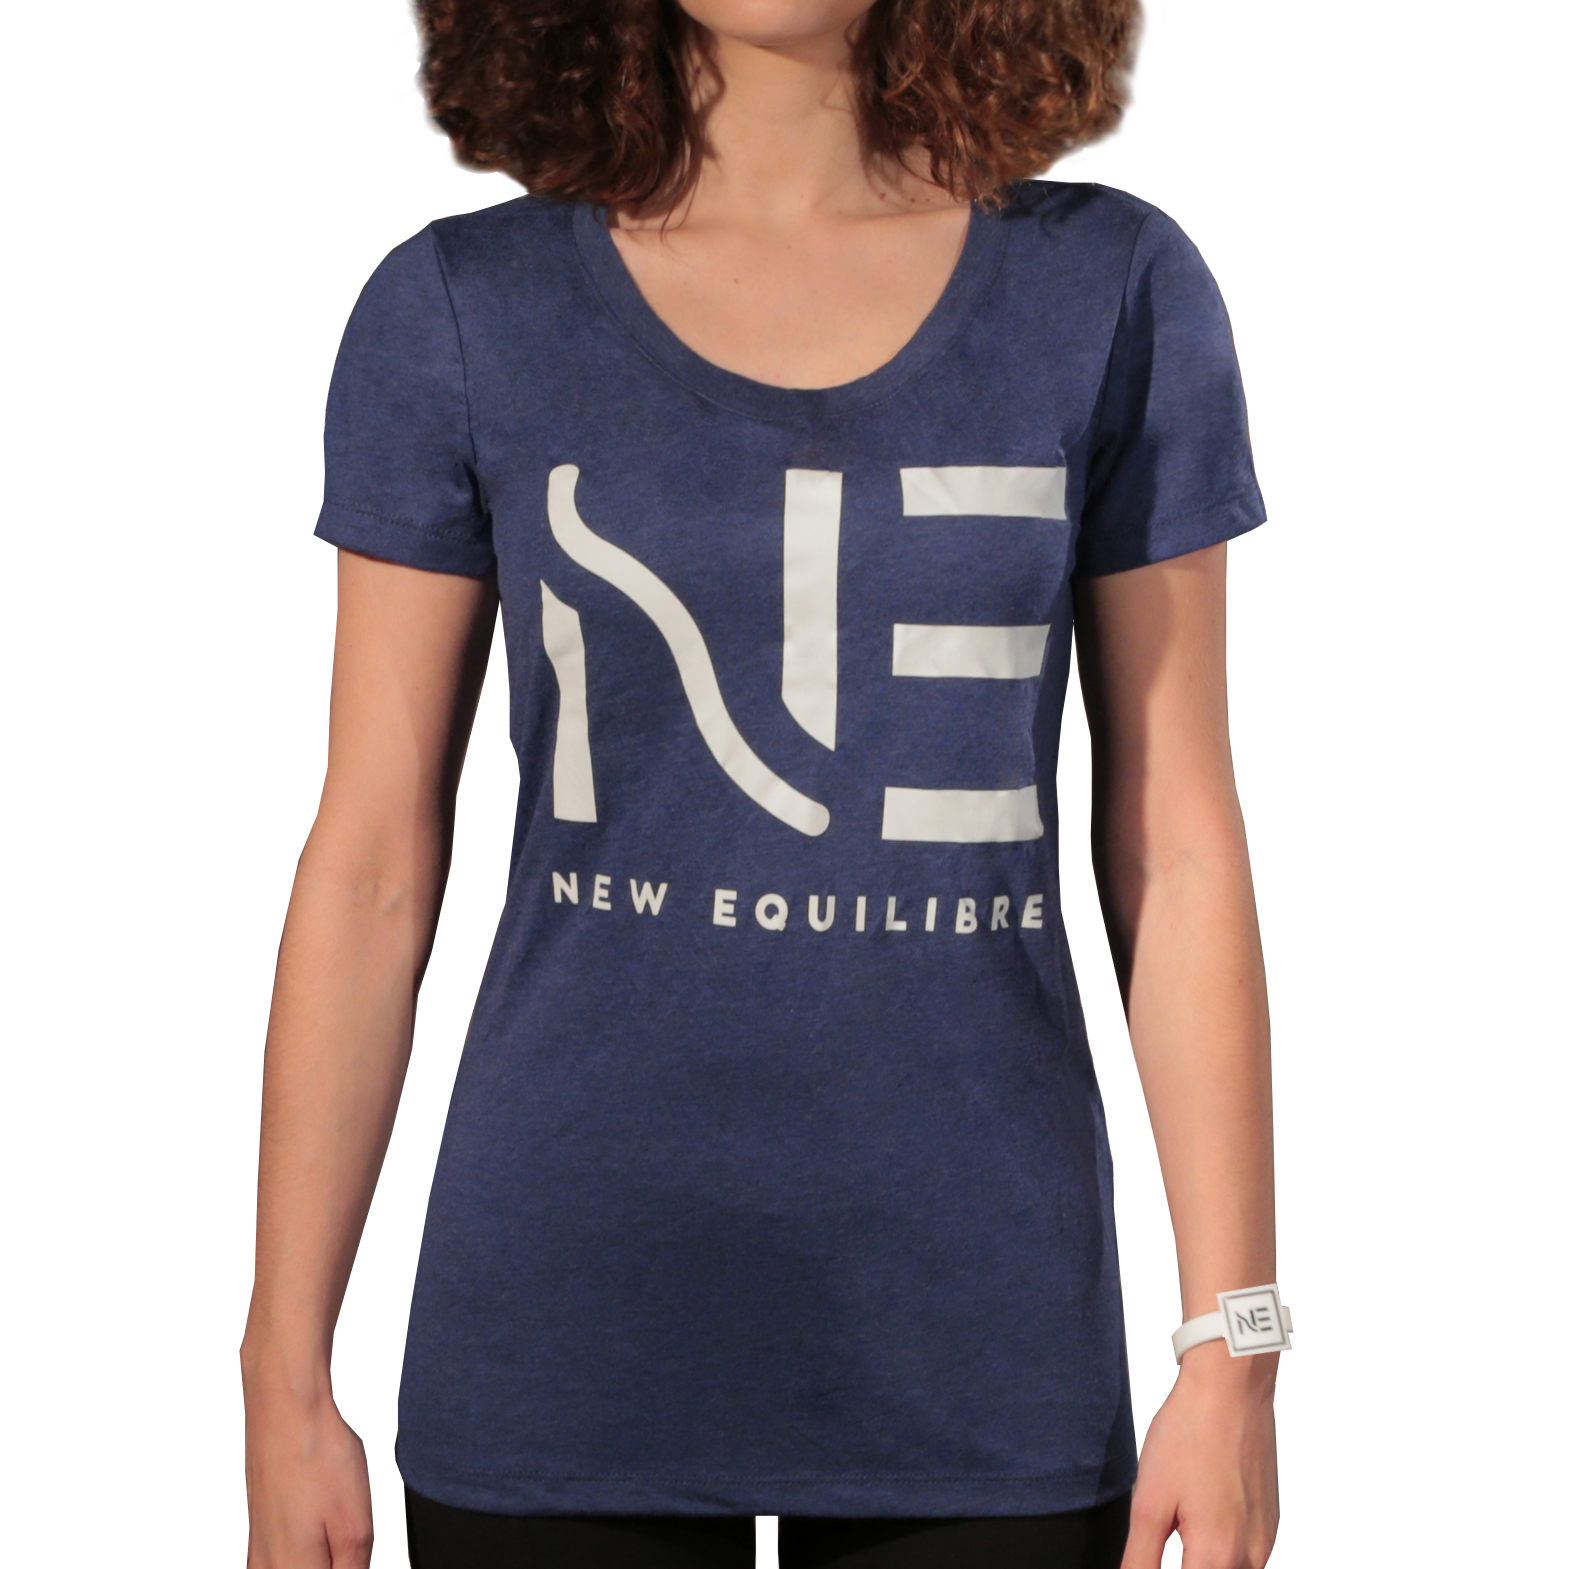 Blendfemme Shirt Tri Shirt Bleu Tri Blendfemme T T Bleu 5LAjR4